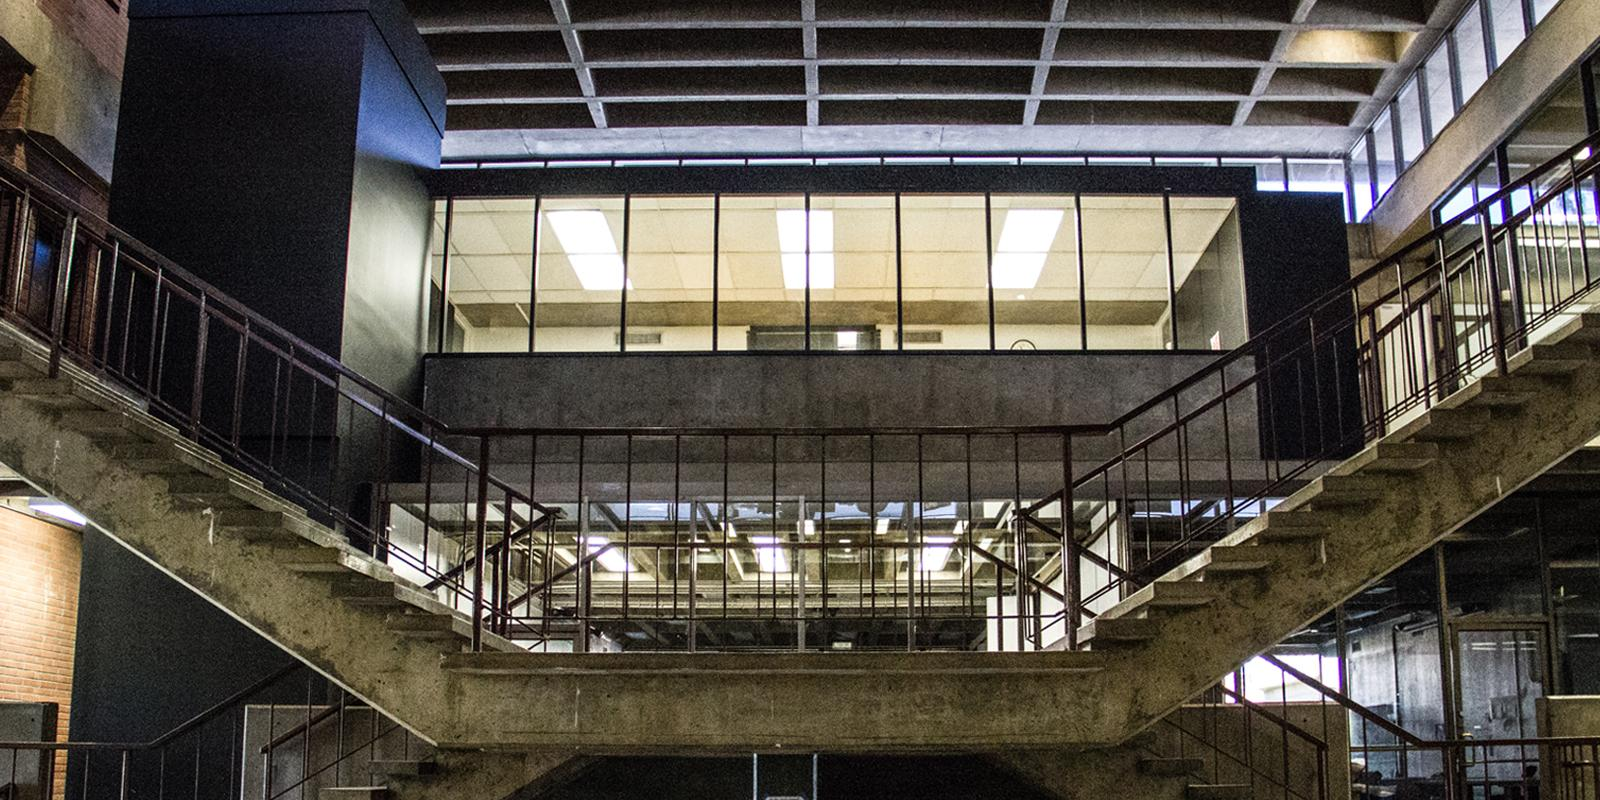 Building 7, designed by famed modernist architect Carl Maston (Mark Maryanovich Photography)